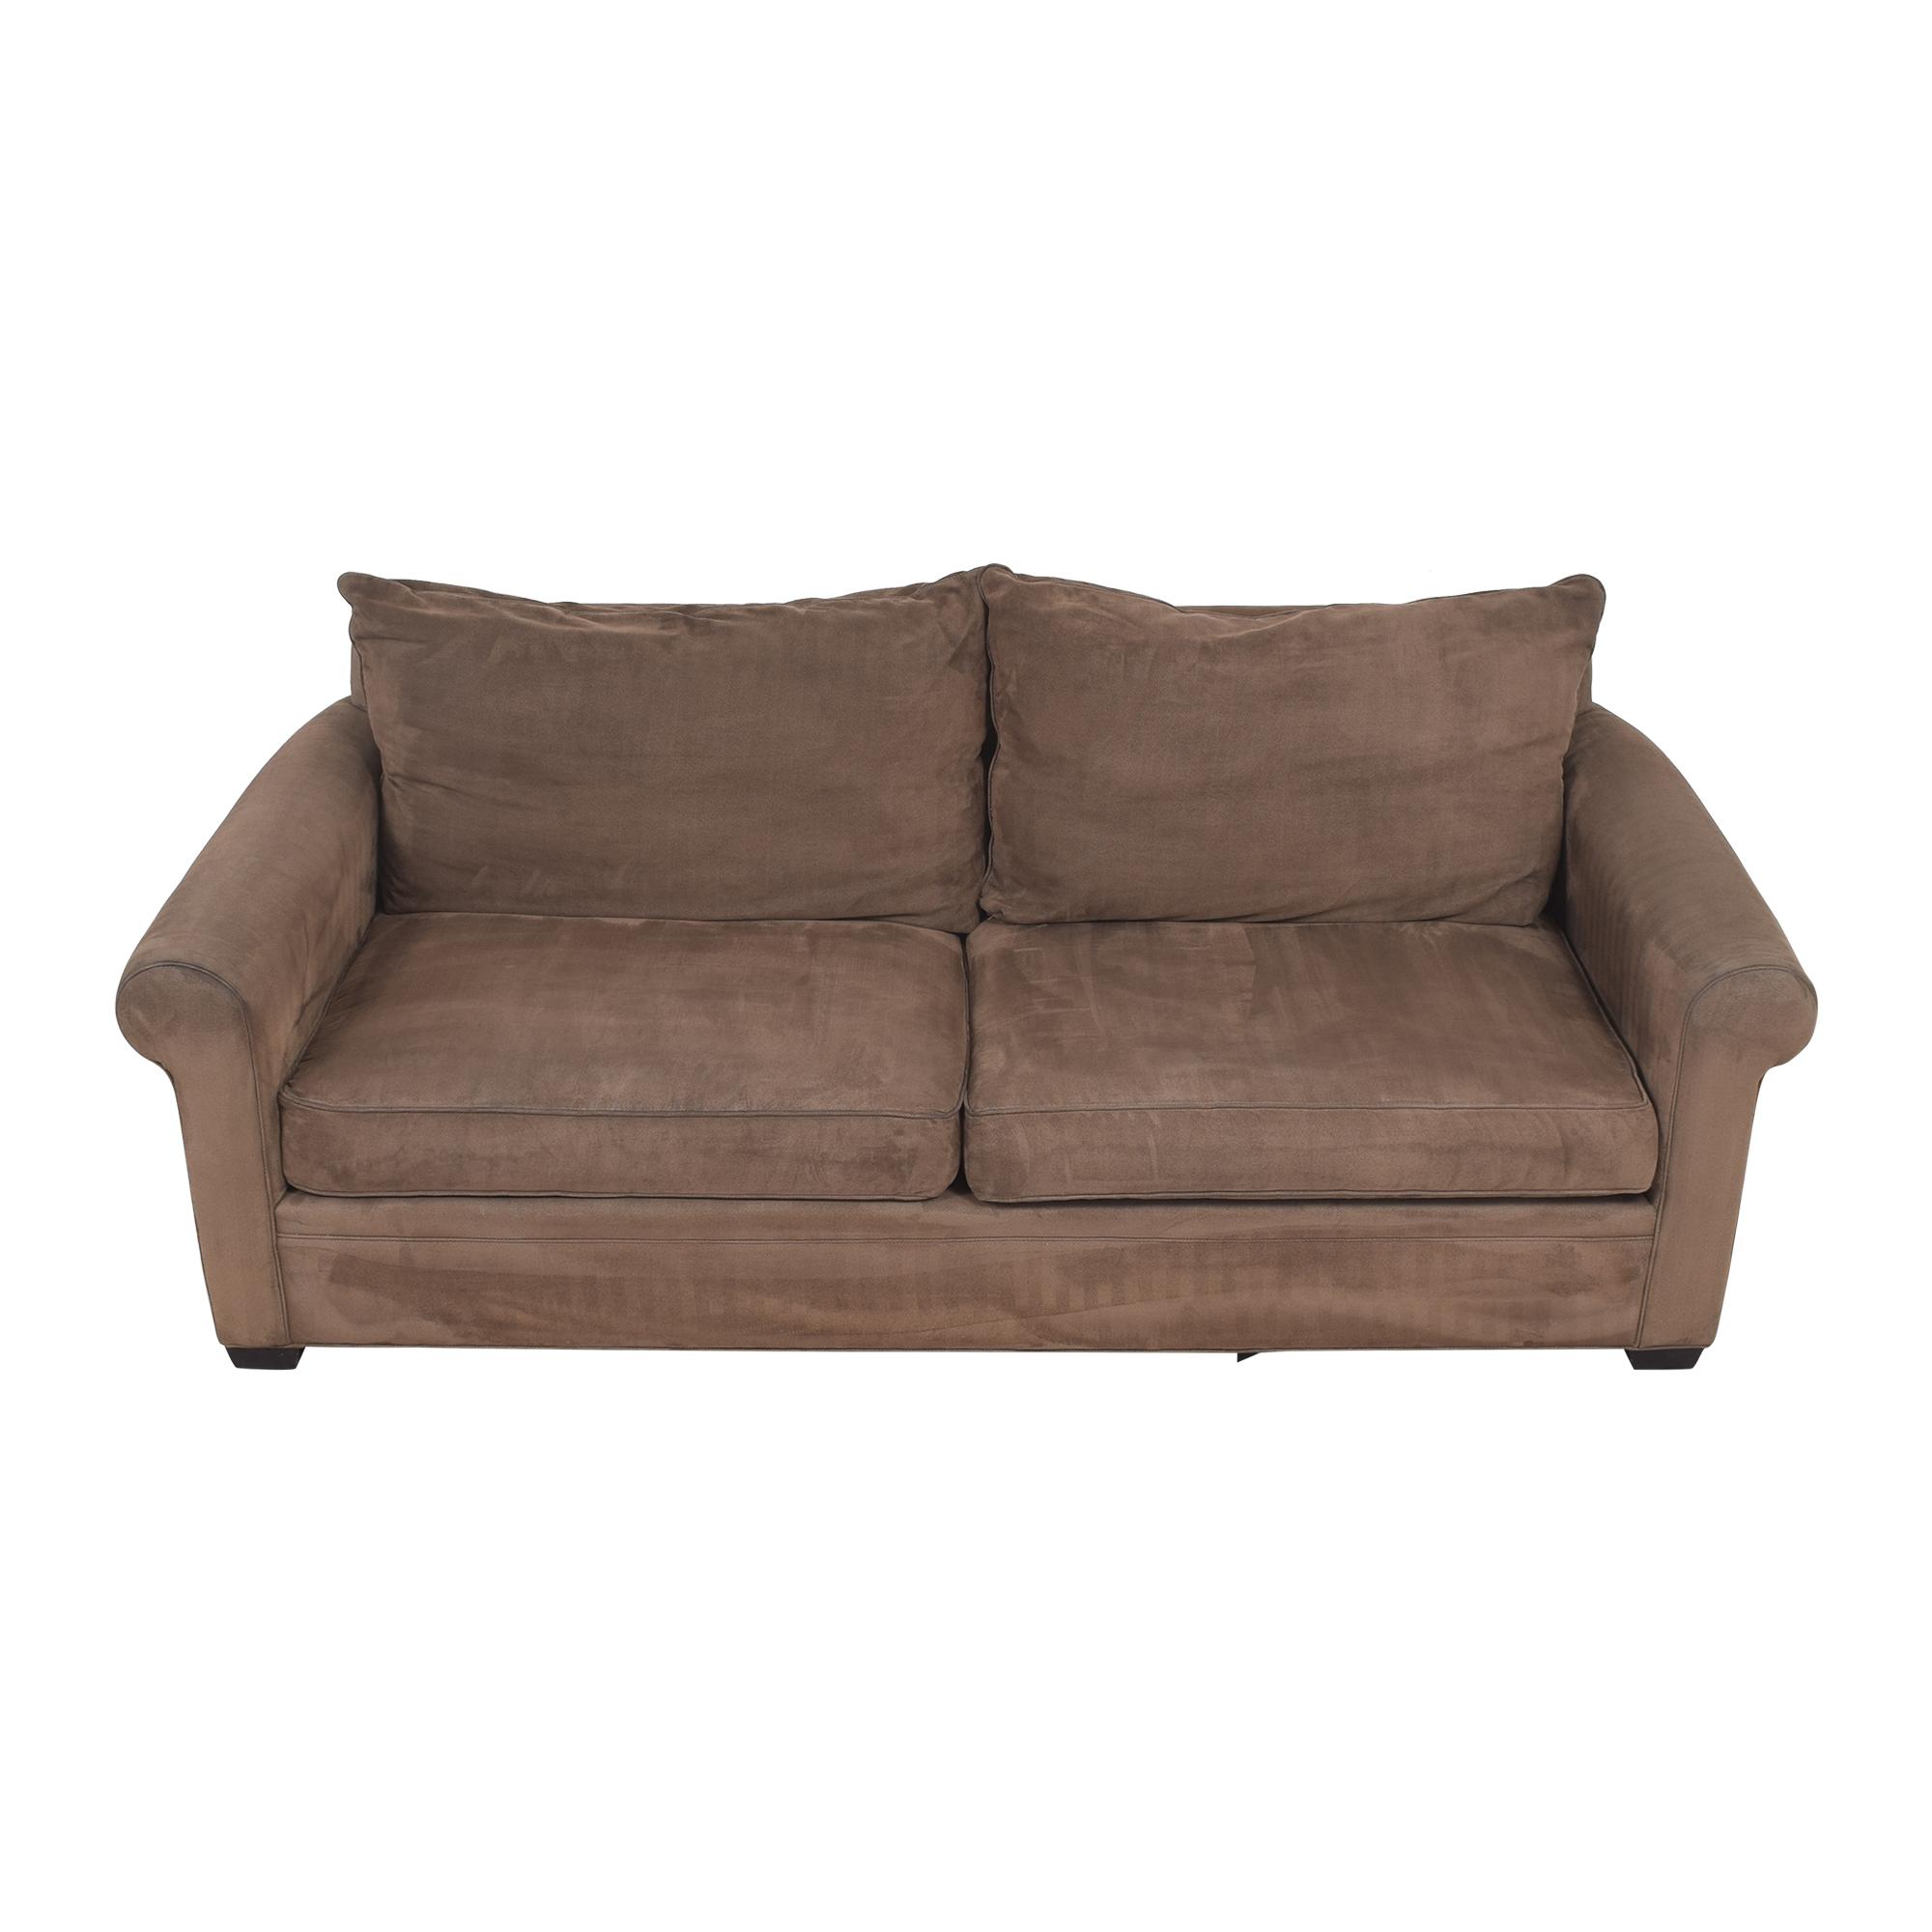 buy Macy's Modern Concepts Two Cushion Sofa Macy's Sofas